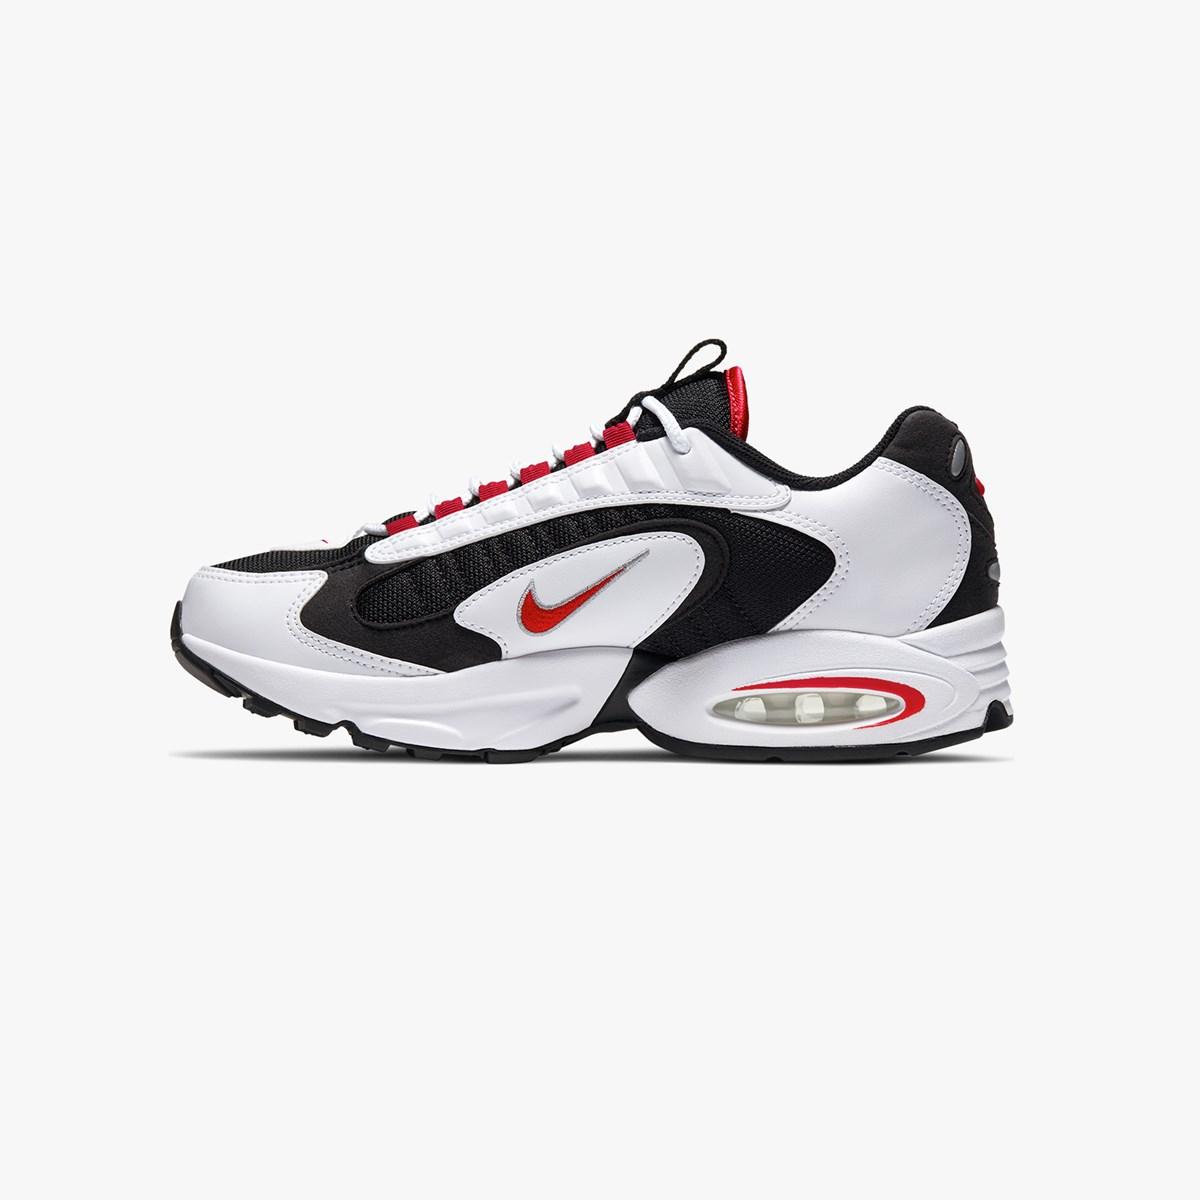 Nike Air Max 96 Triax QS Cd2053 105 Sneakersnstuff | sneakers & streetwear online since 1999